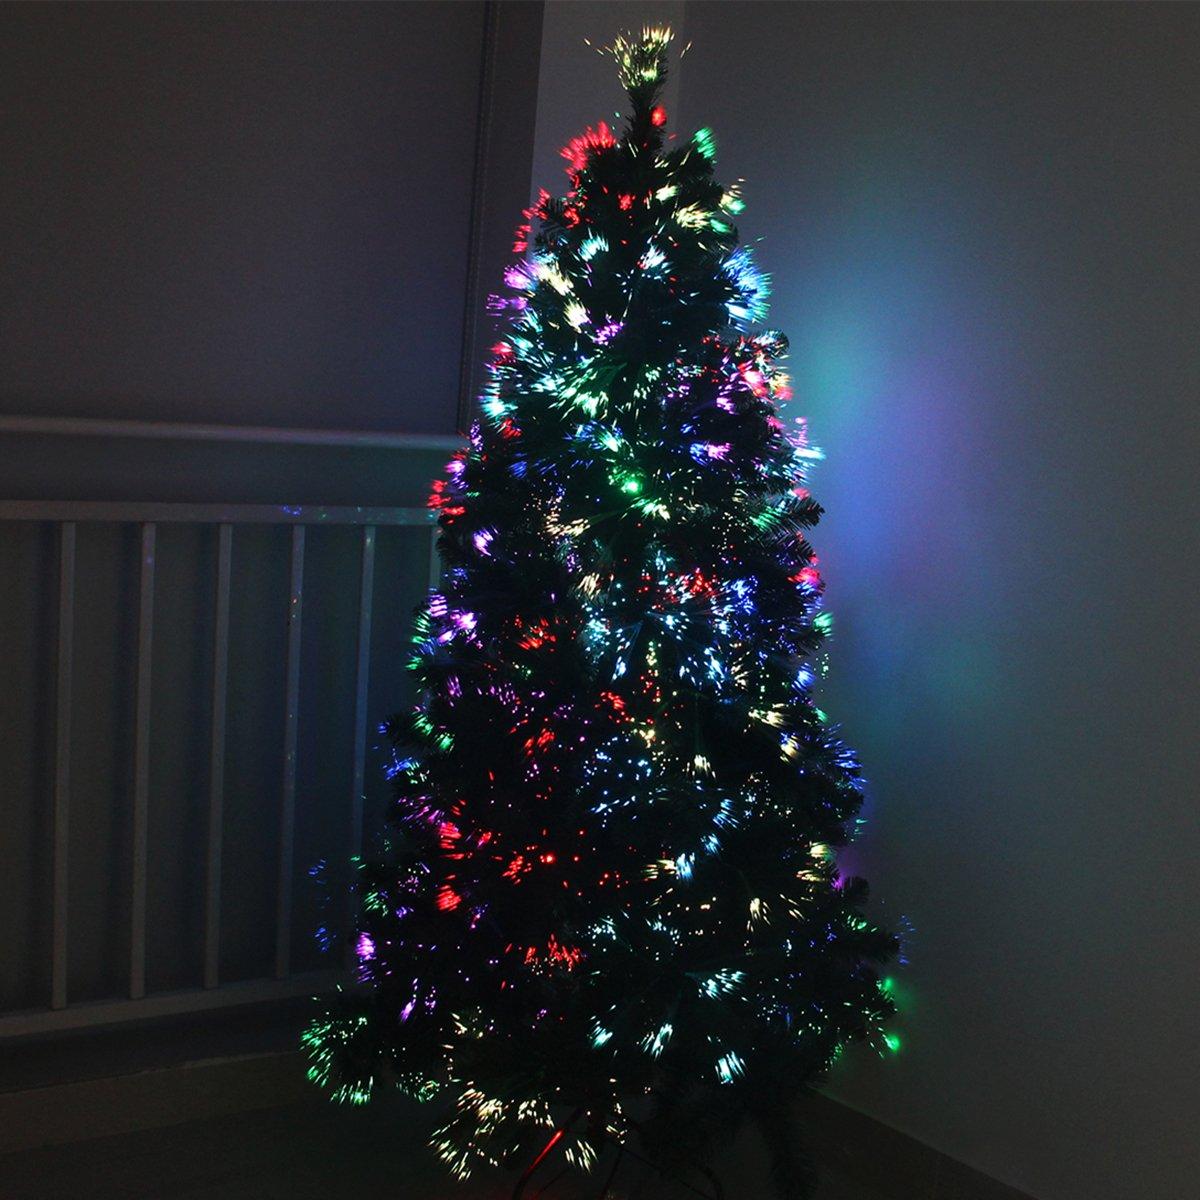 k nstlicher led weihnachtsbaum christbaum mit leds beleuchtet dekoration ebay. Black Bedroom Furniture Sets. Home Design Ideas